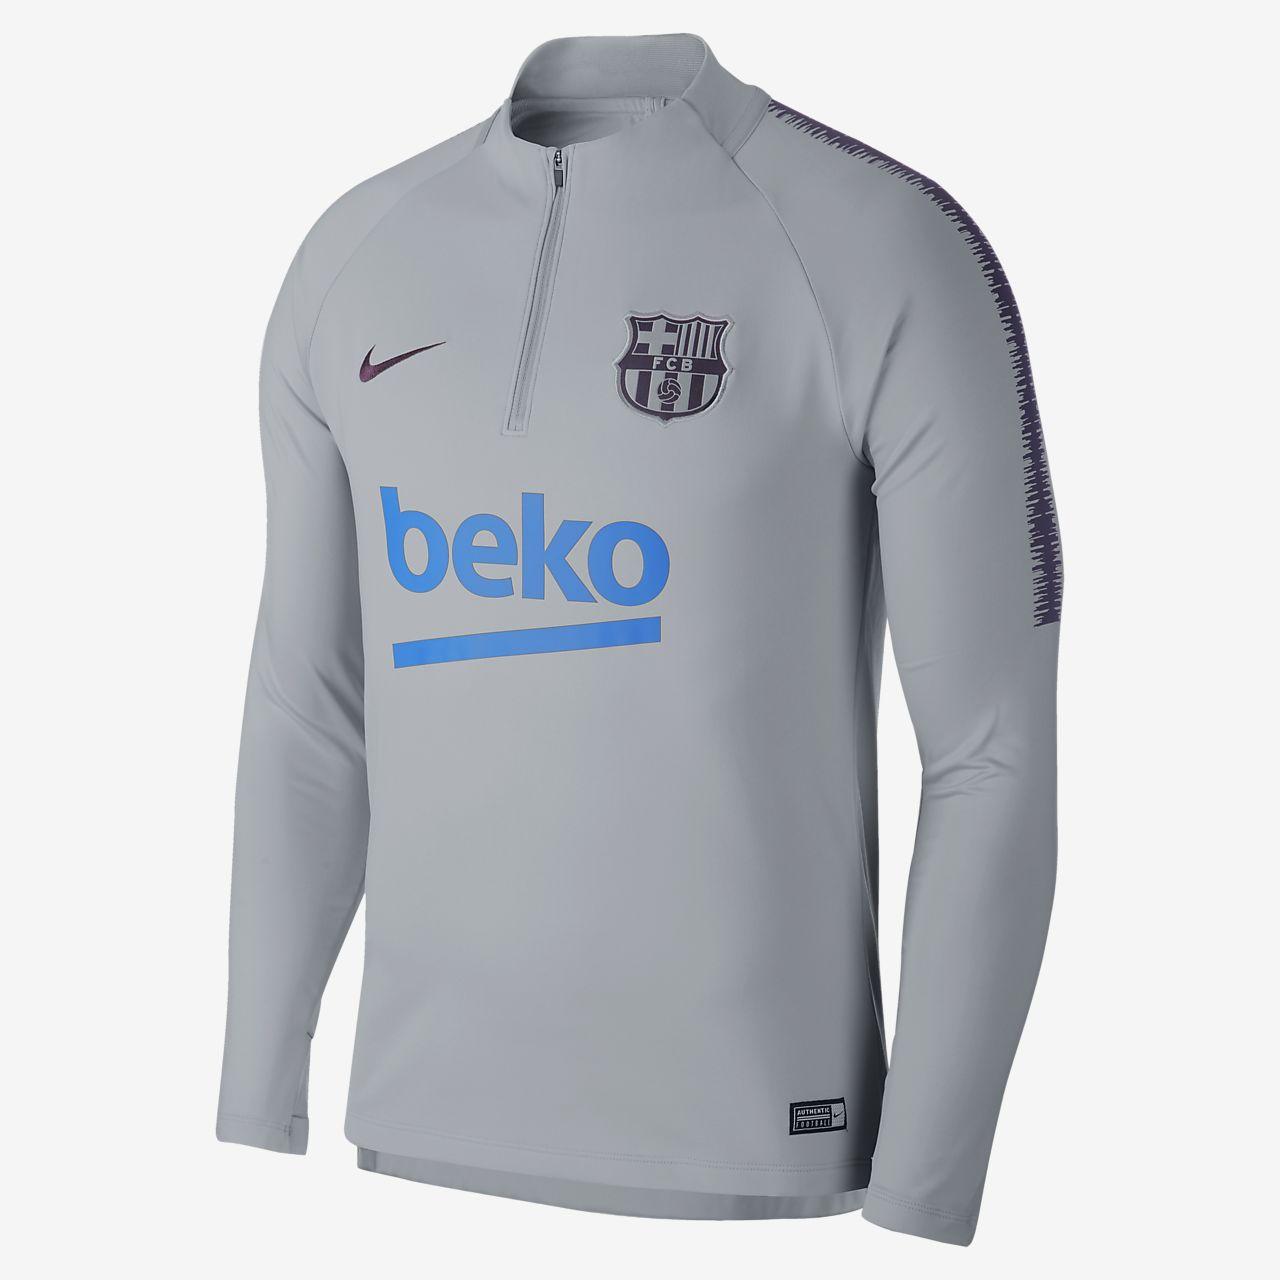 99c41c063c7 FC Barcelona Dri-FIT Squad Drill Men s Long-Sleeve Football Top ...